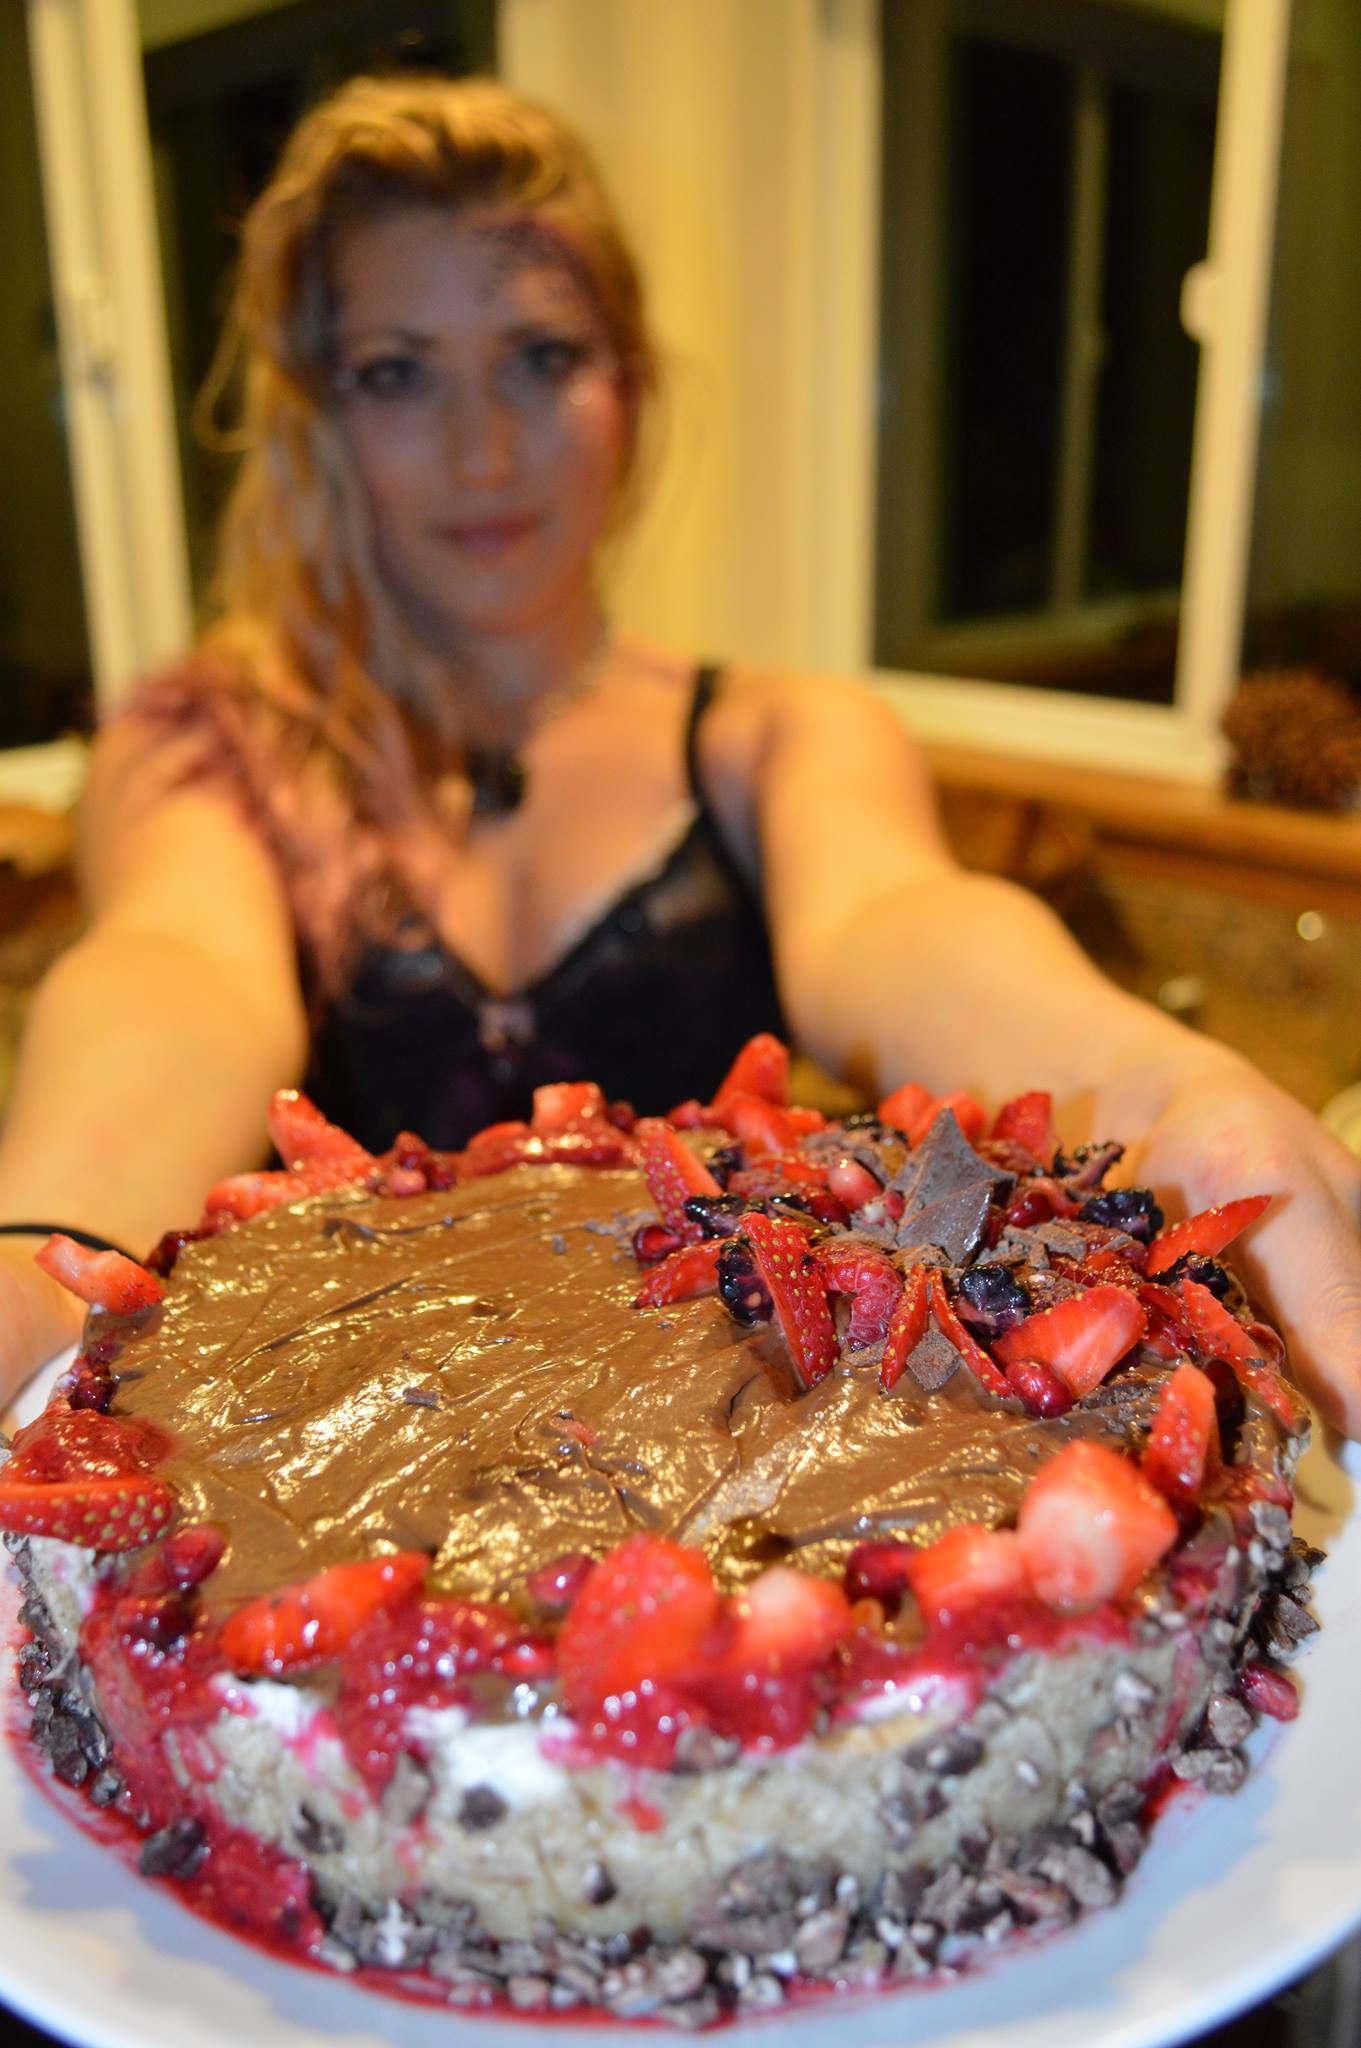 Lindsay's raw vegan coconut vanilla cashew ice cream chocolate mousse bleeding-heart Lupercalia Love cake